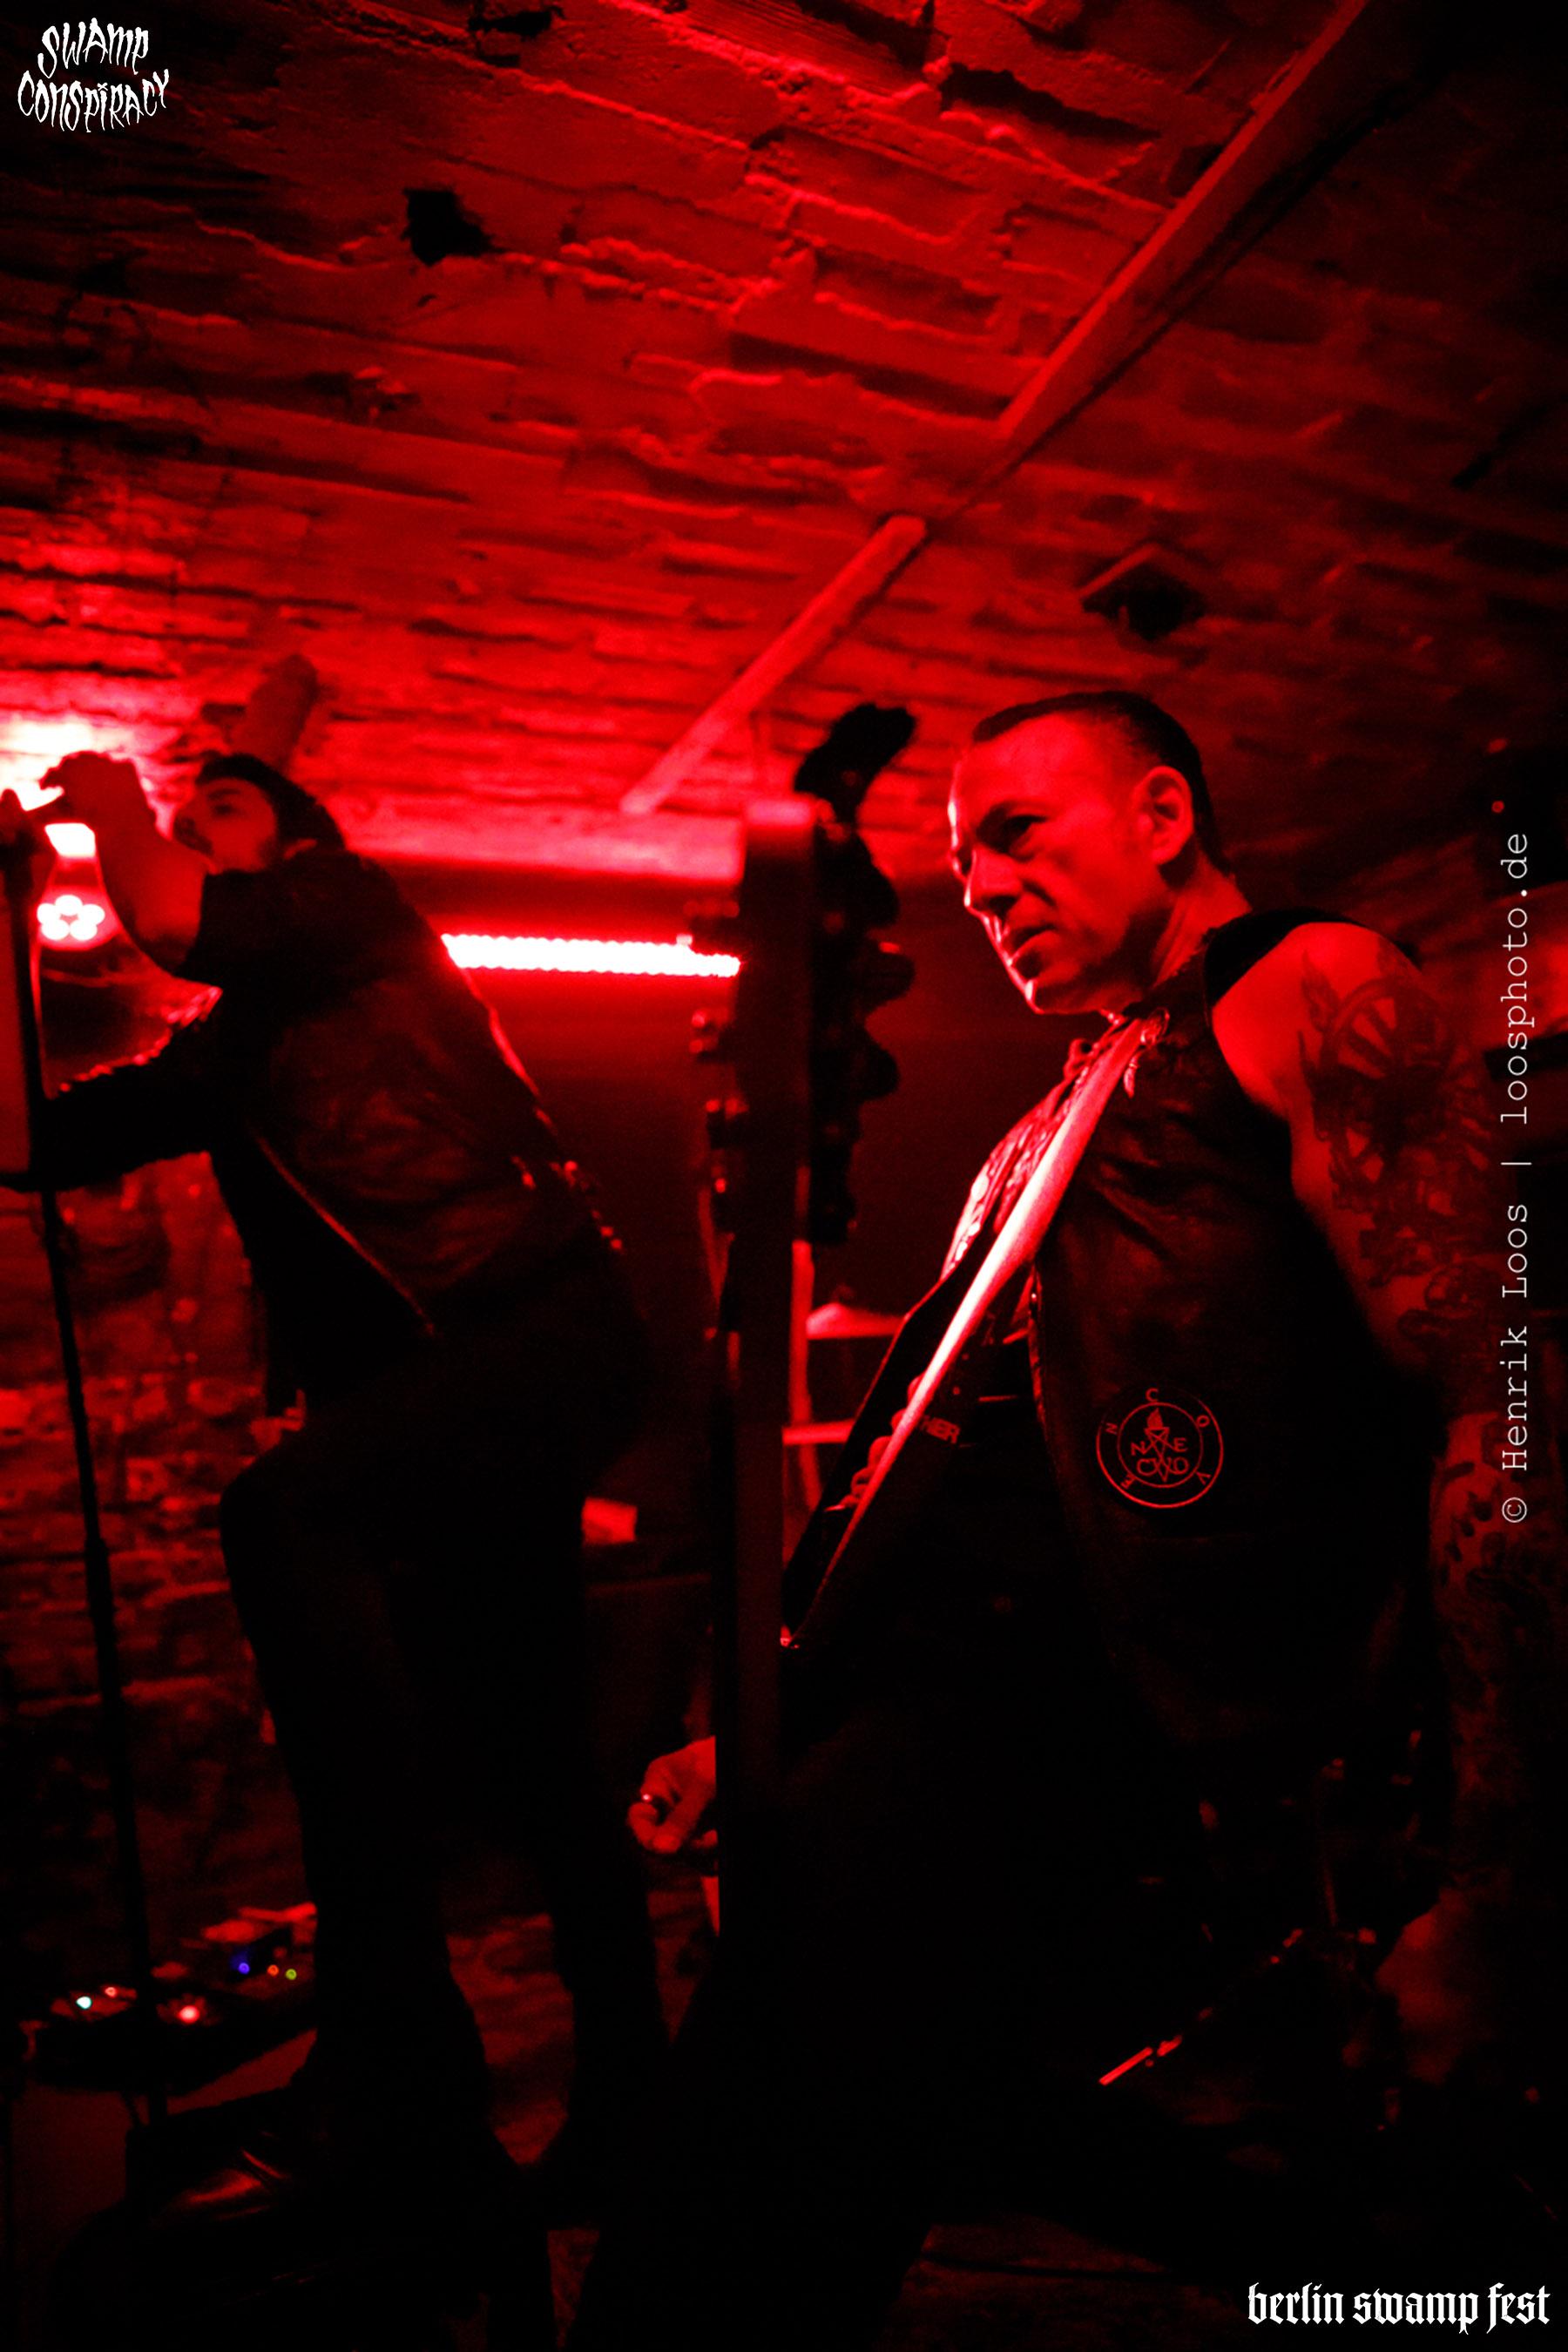 Morast_Berlin_Swamp_Fest_2019_1